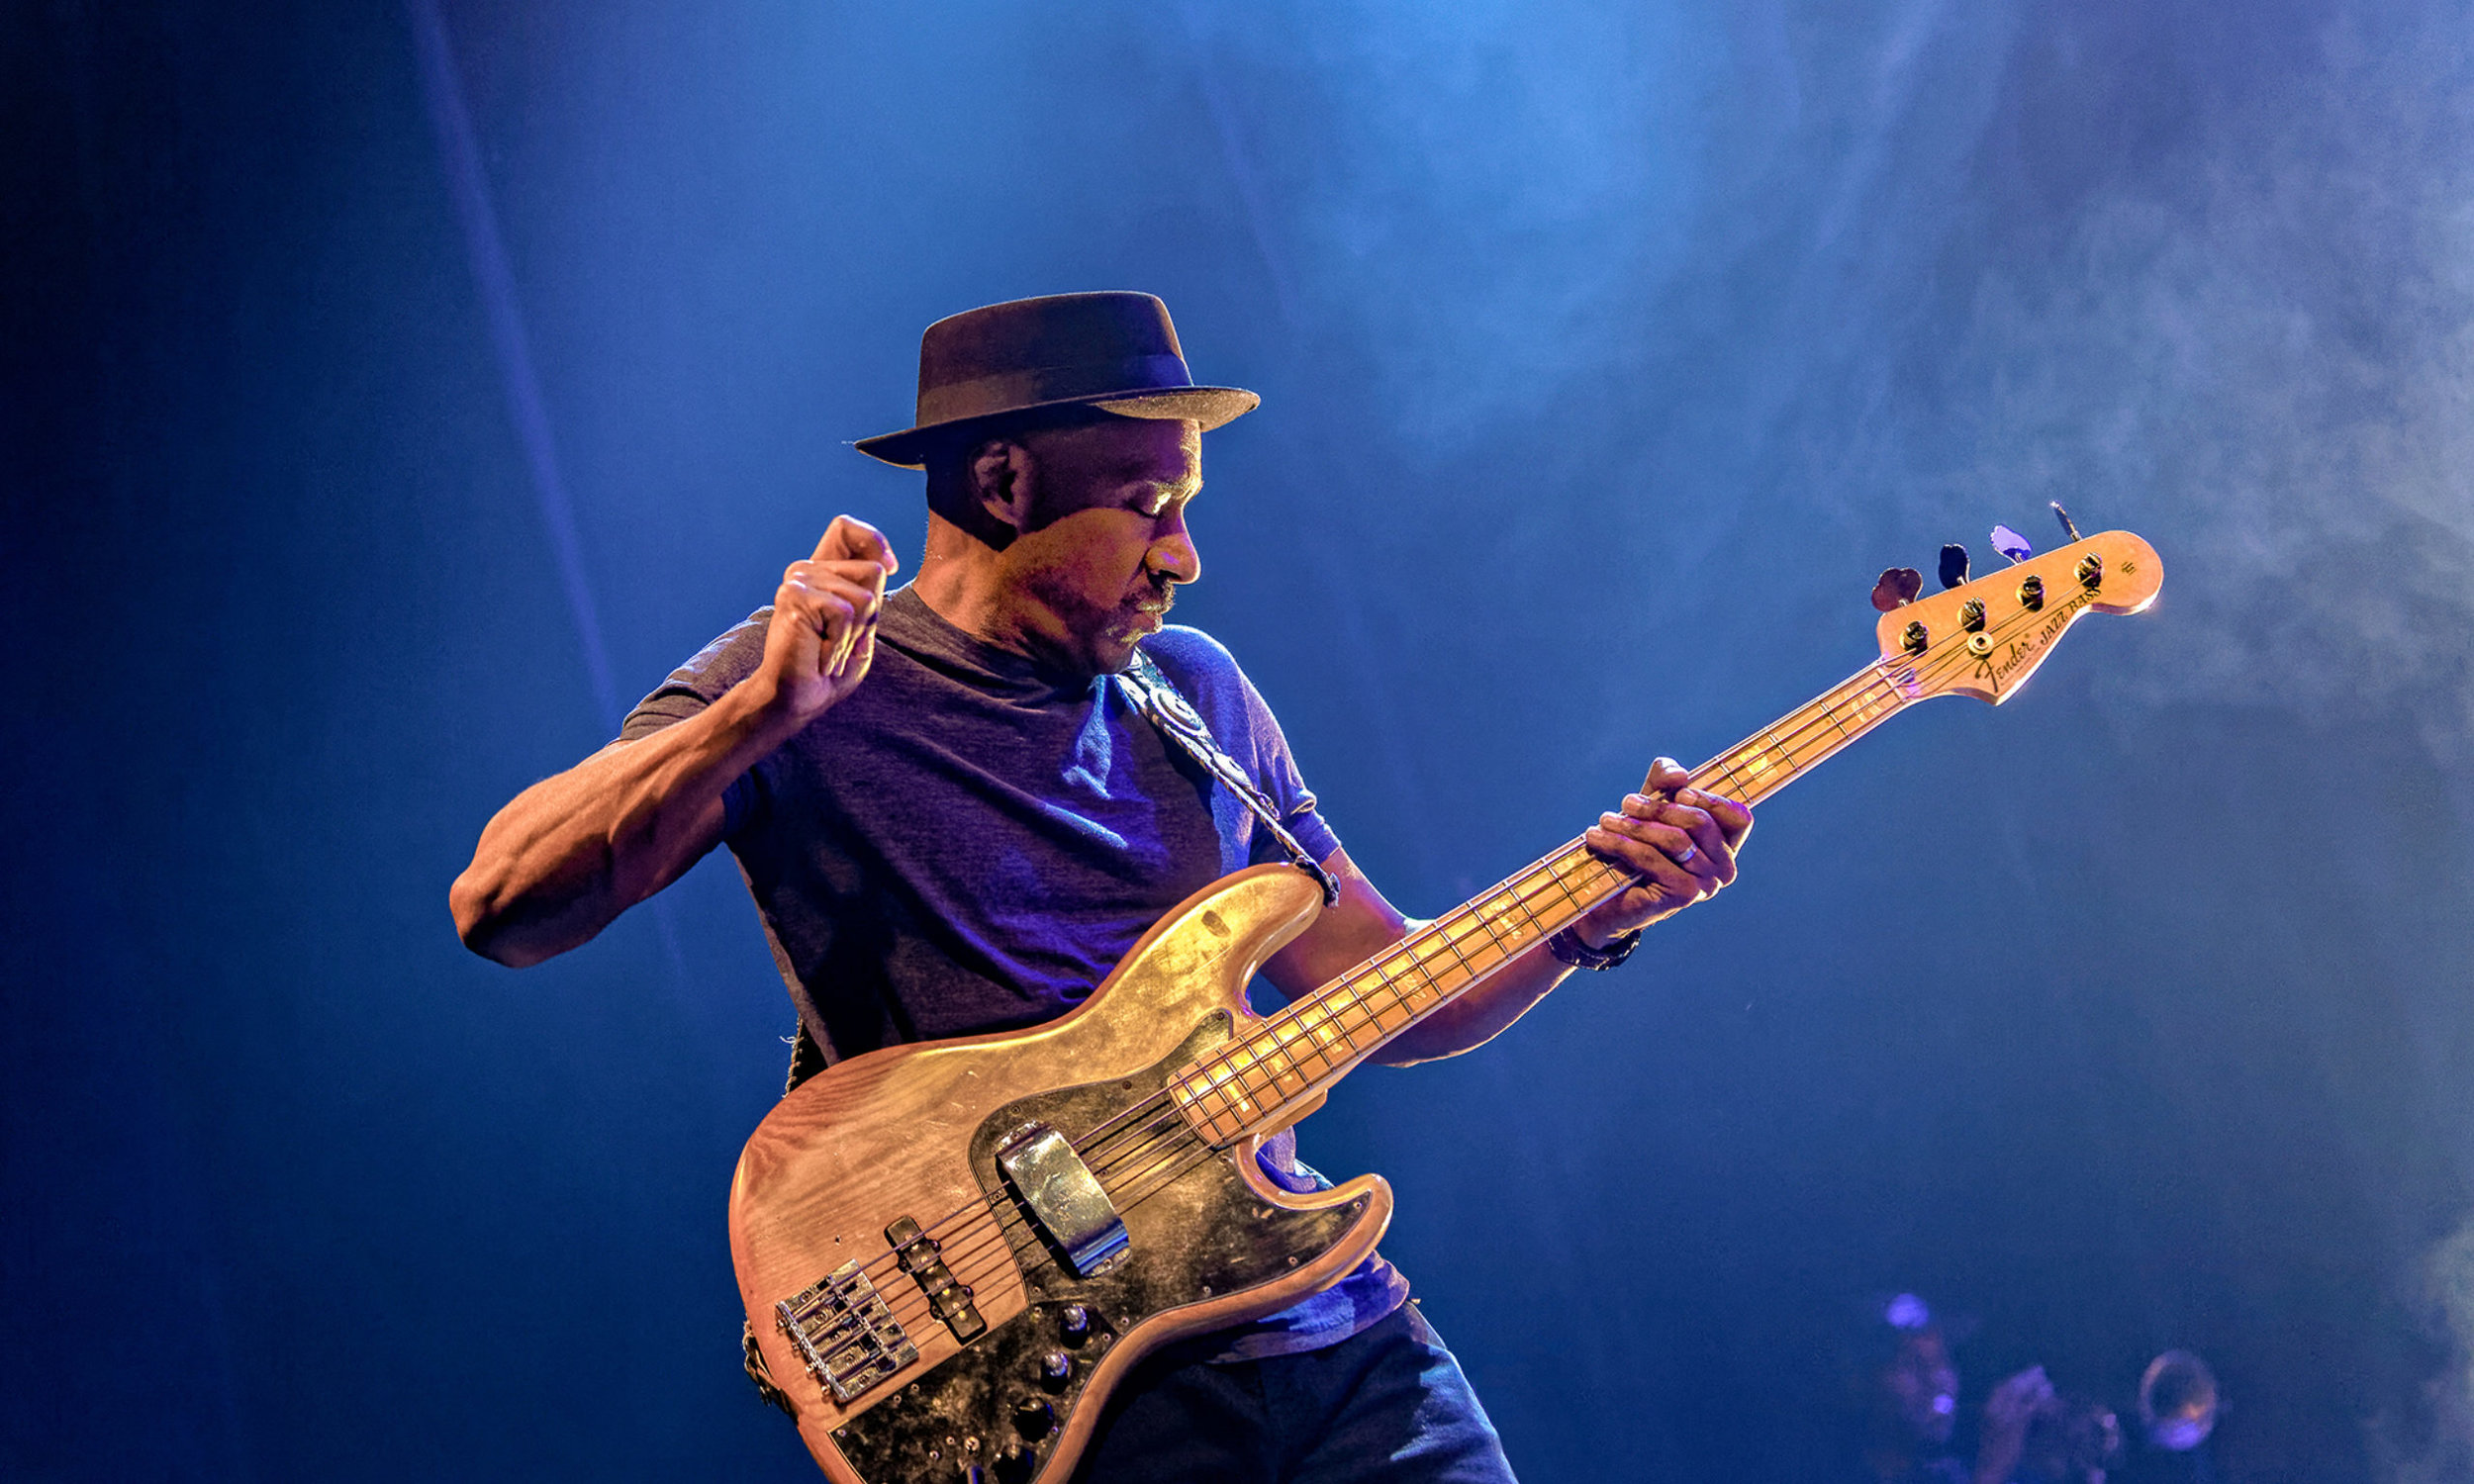 Marcus Miller - et fyrverkeri av en jazzmusiker. Foto: Moldejazz